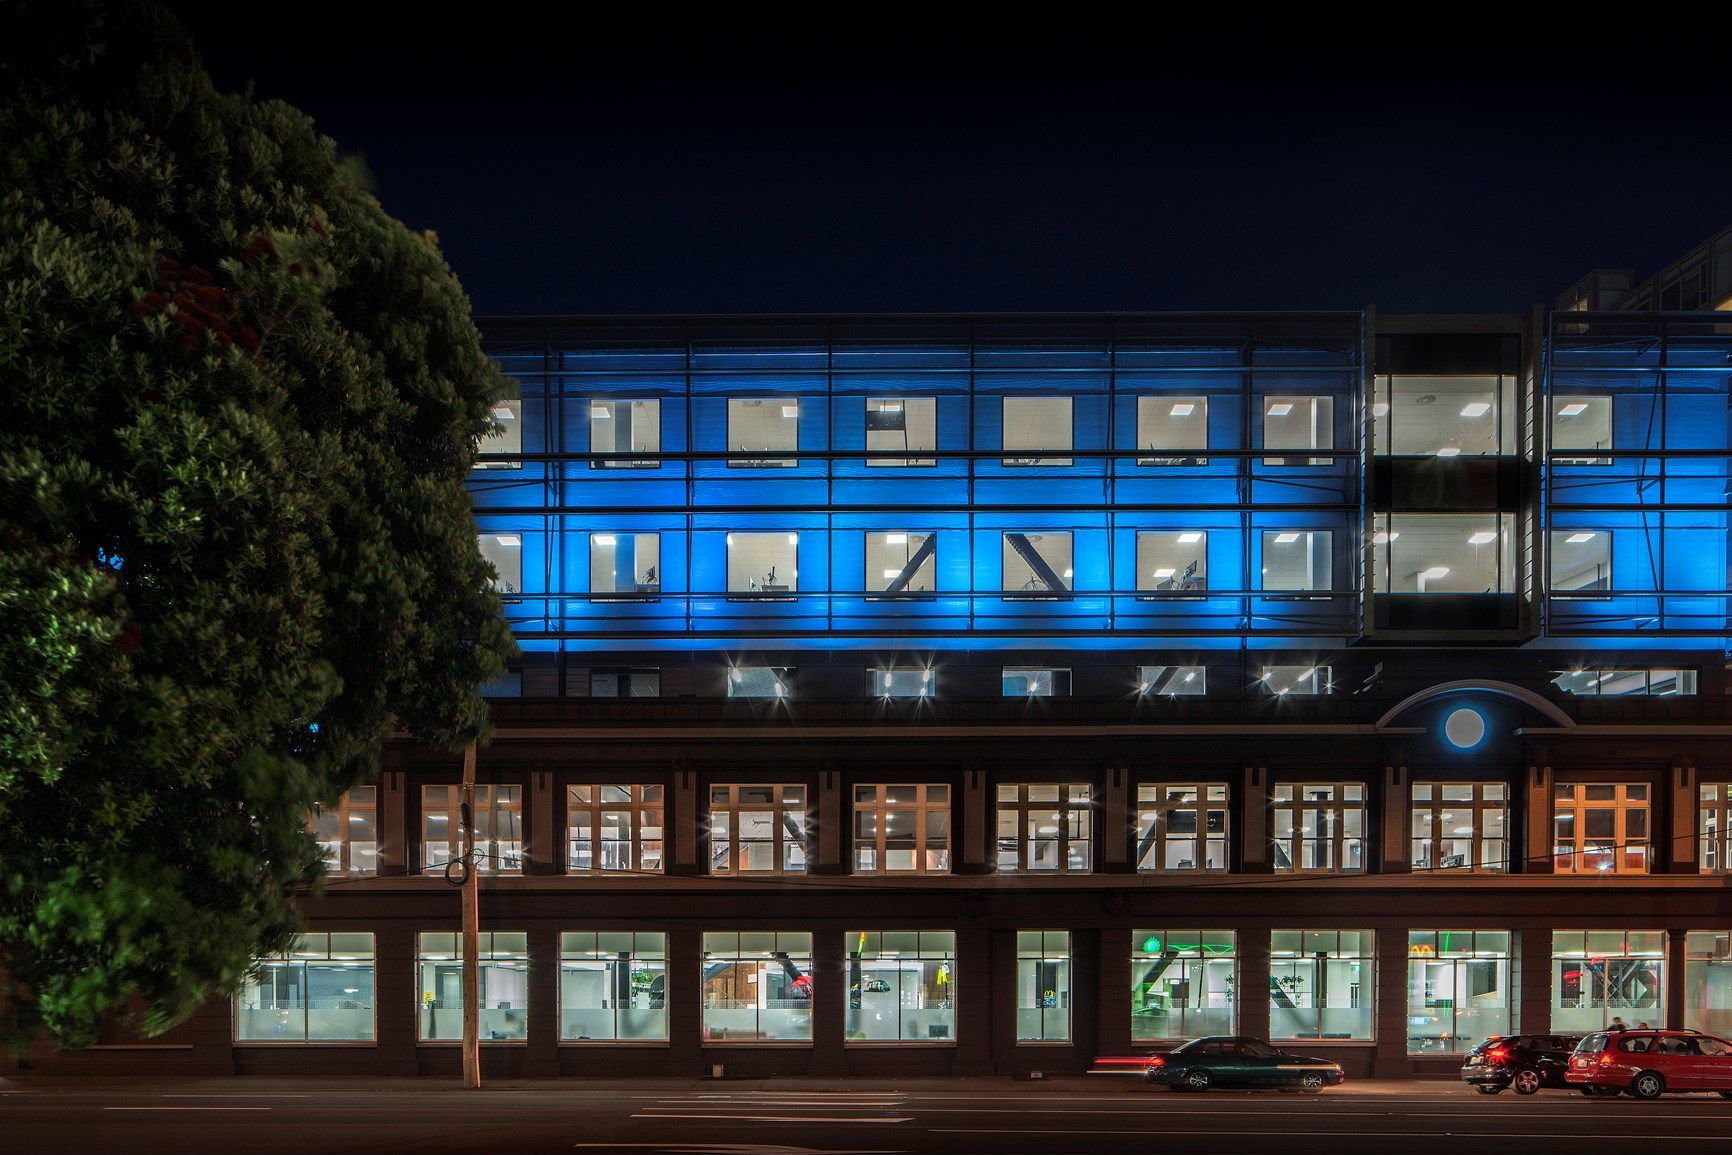 Manthel Motors Building di Wellington - Copyright: Asvisual Andy Spain